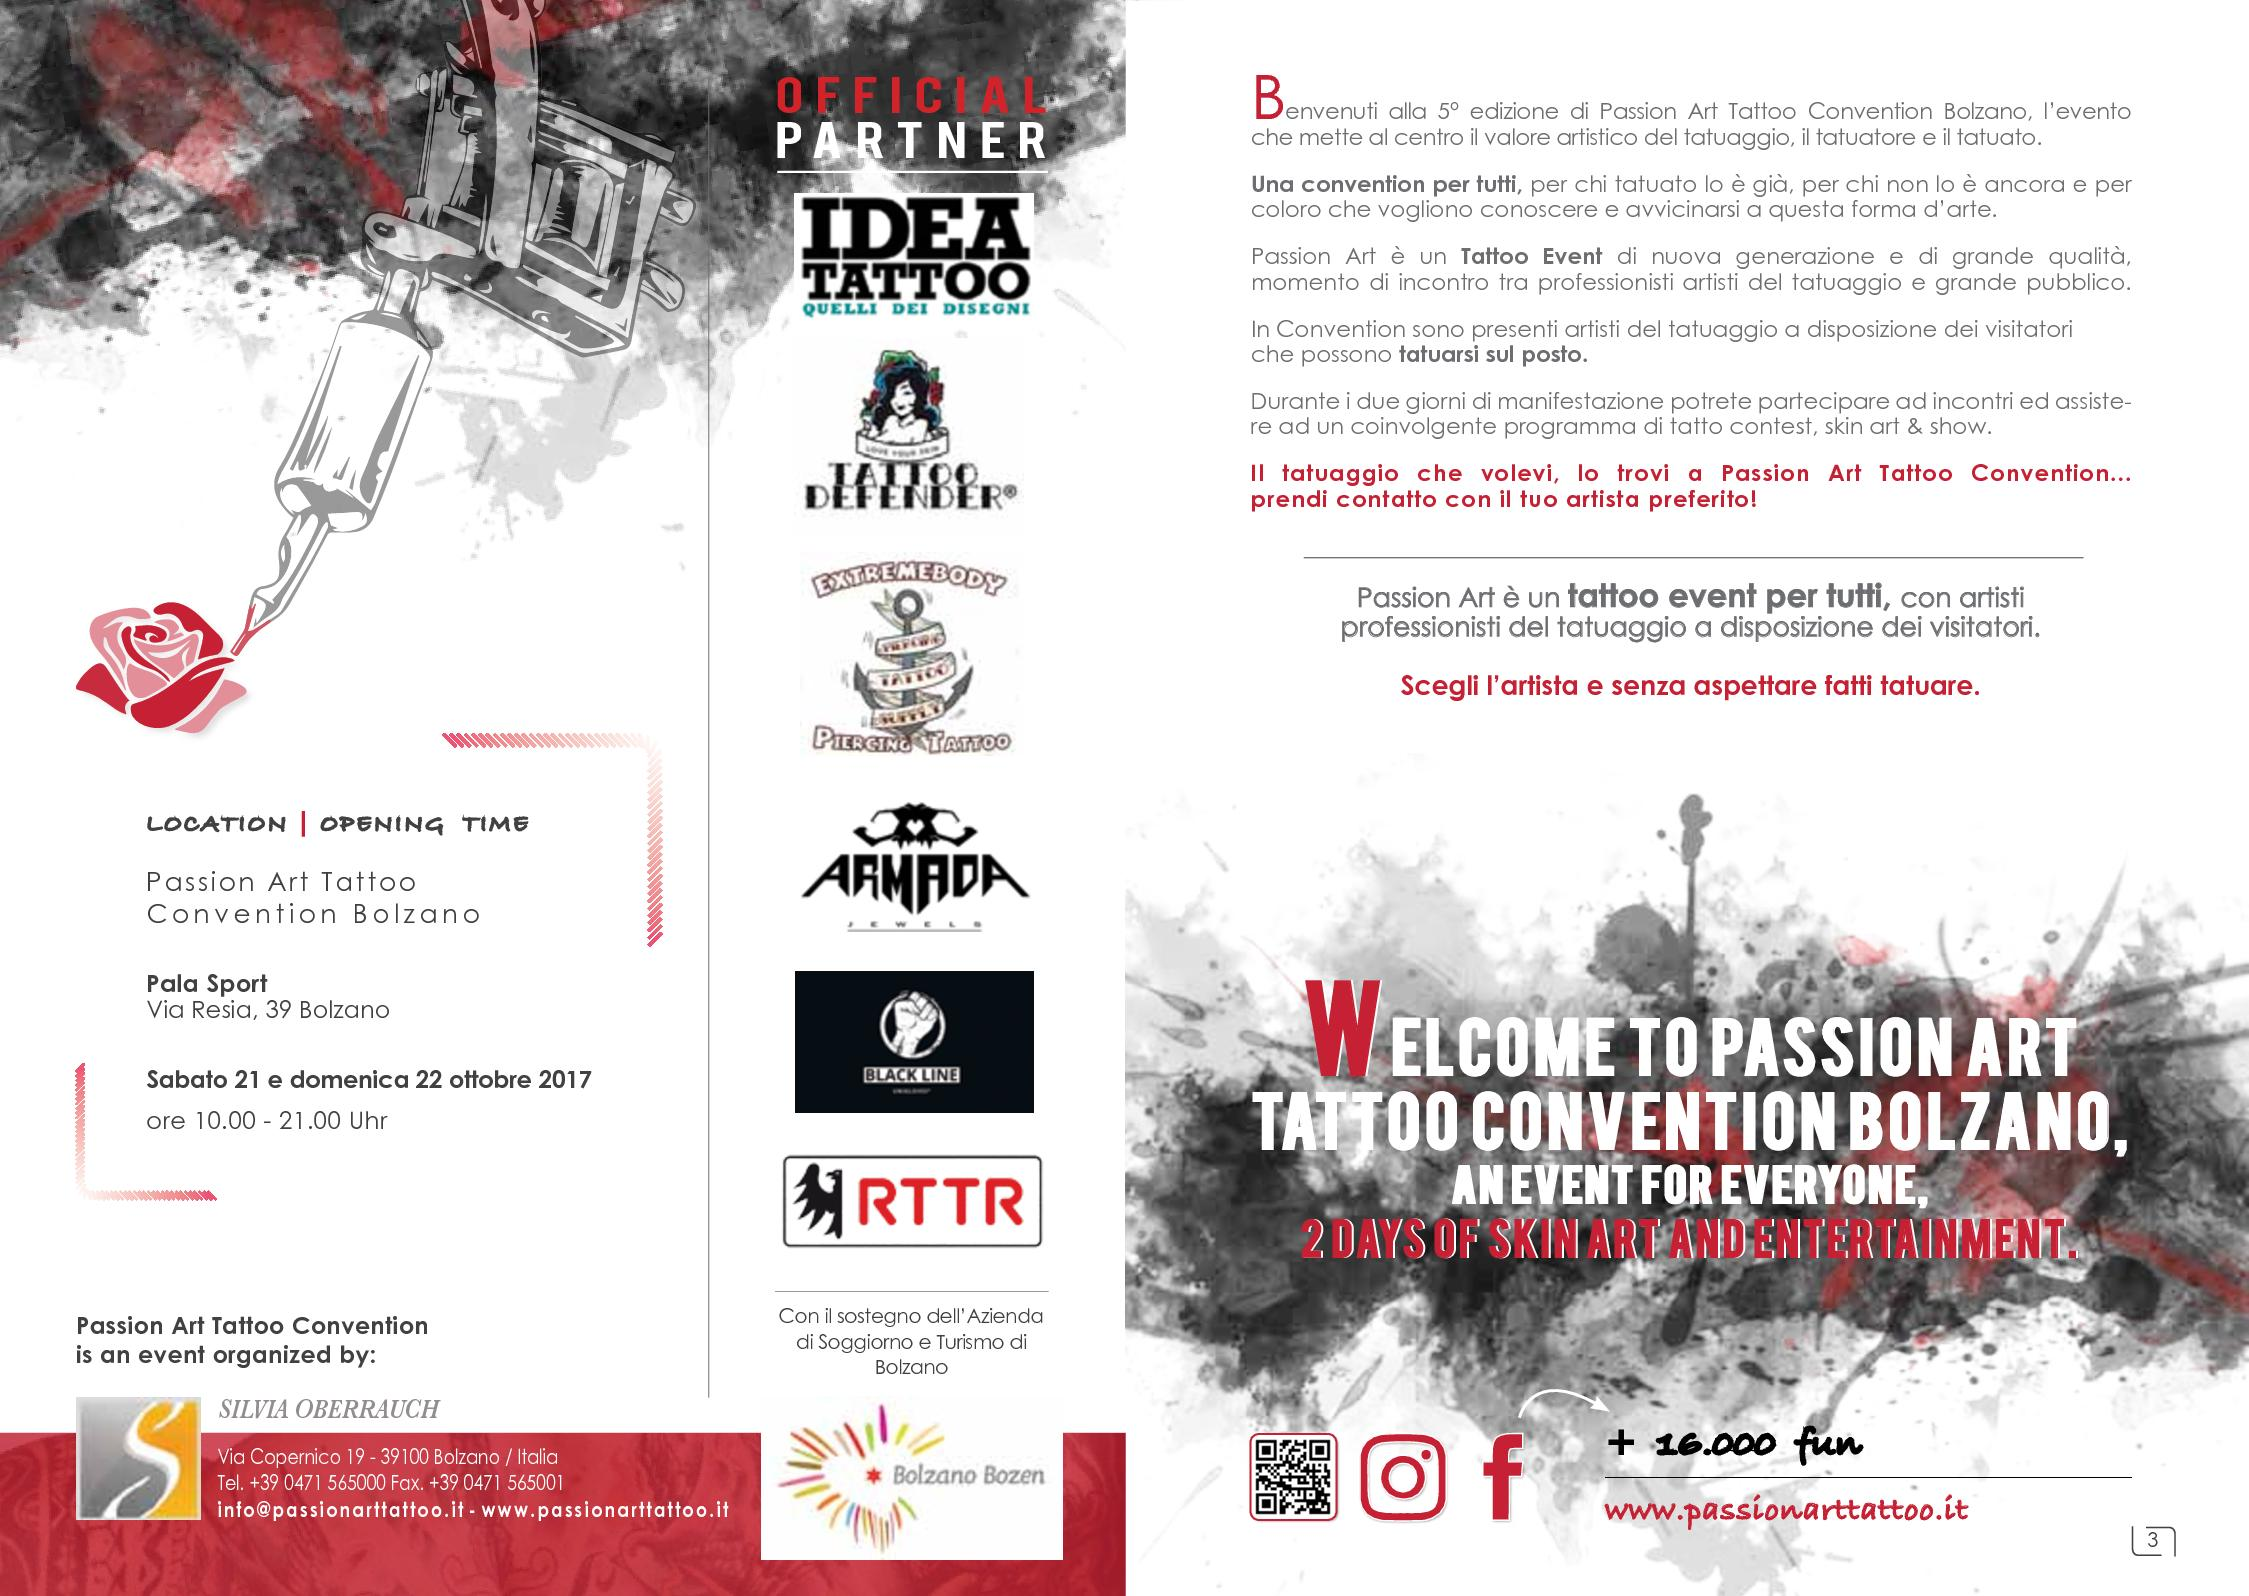 Catalogo Passion Art Tattoo Bz 2017 - CALAMEO Downloader